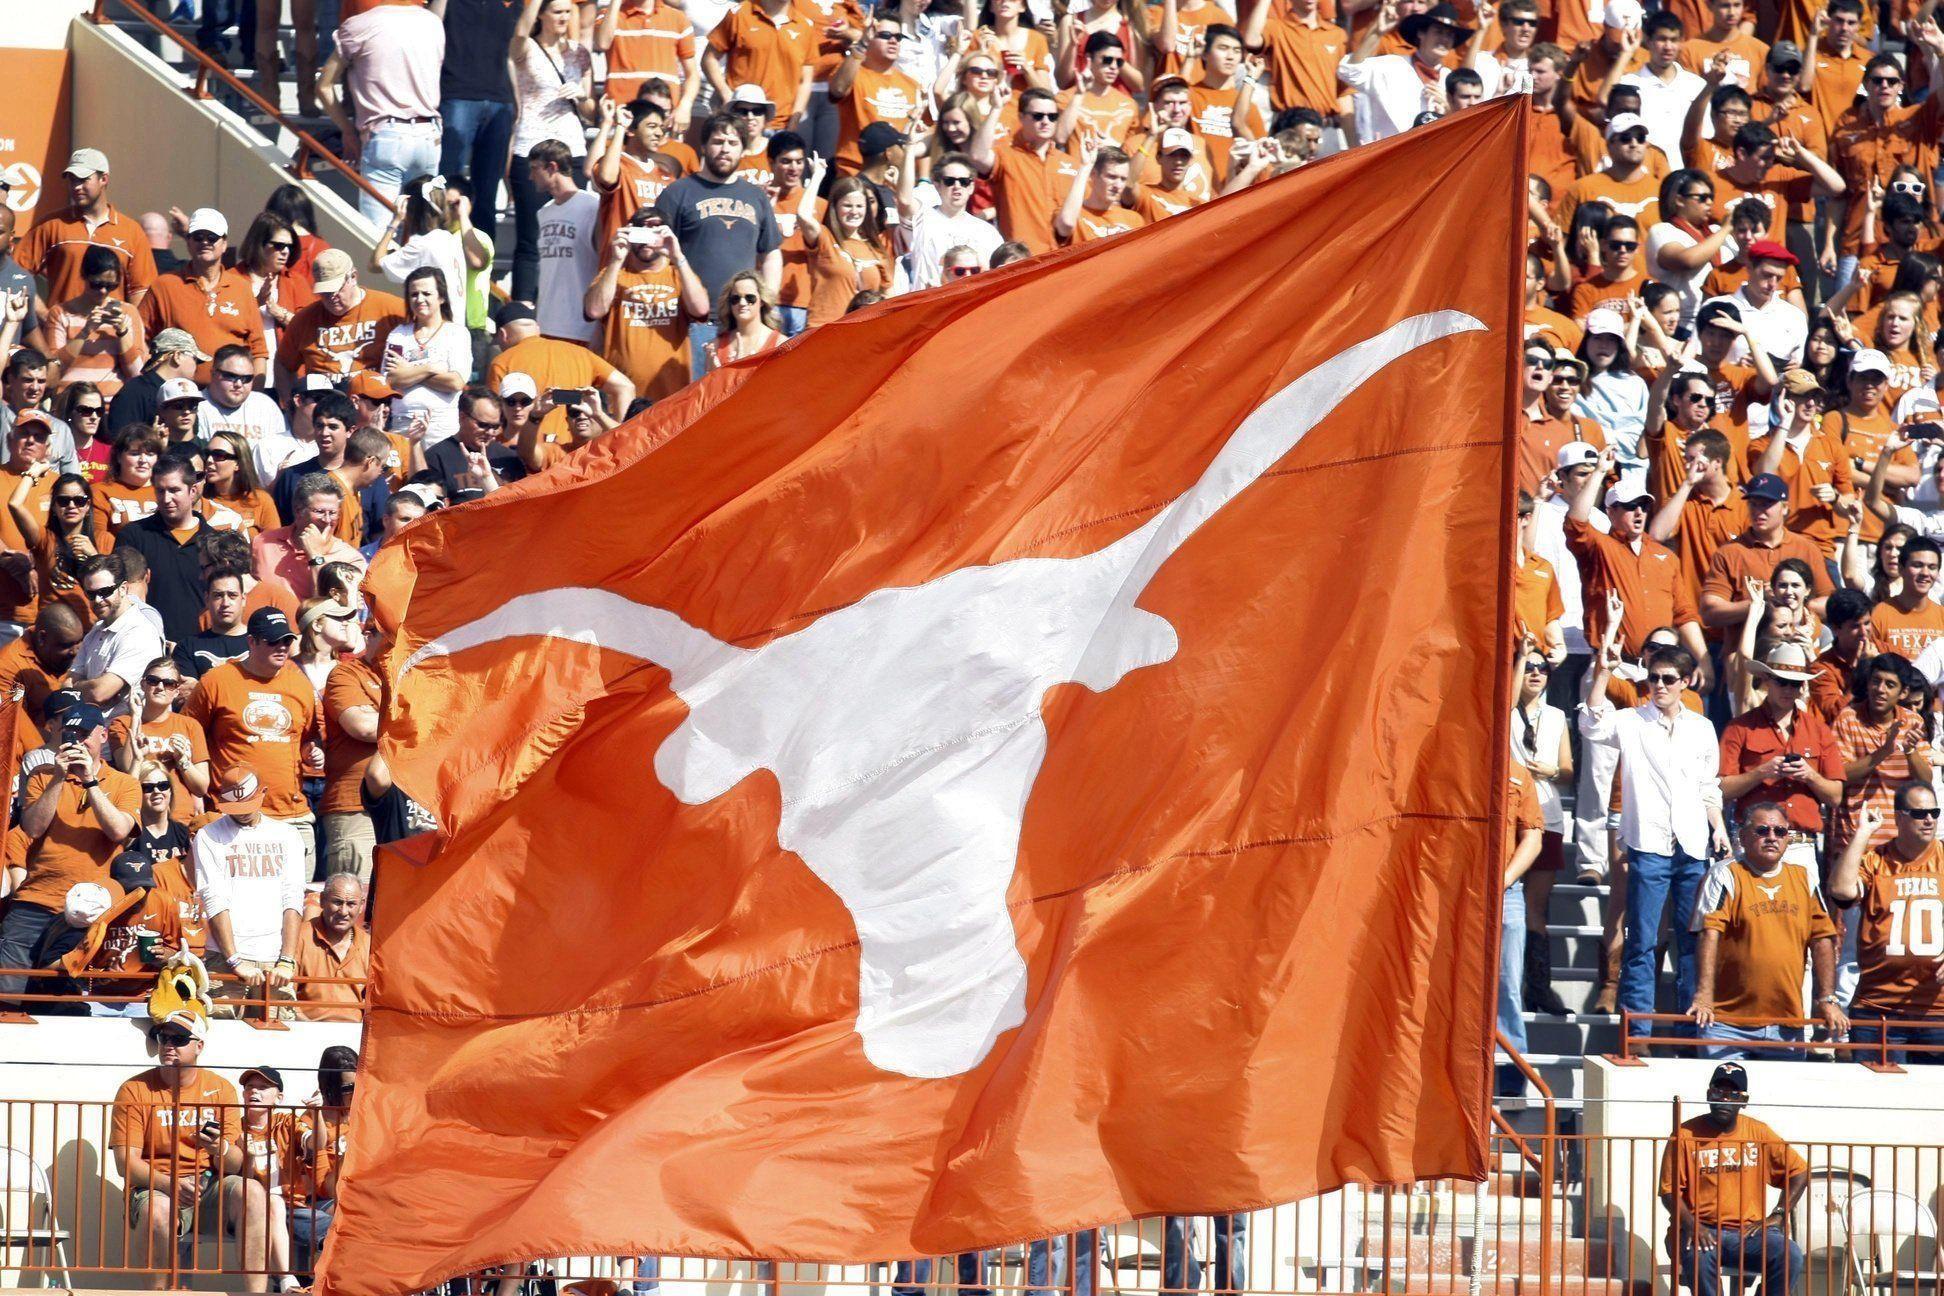 Texas Longhorns Football Wallpapers Free Download | PixelsTalk.Net